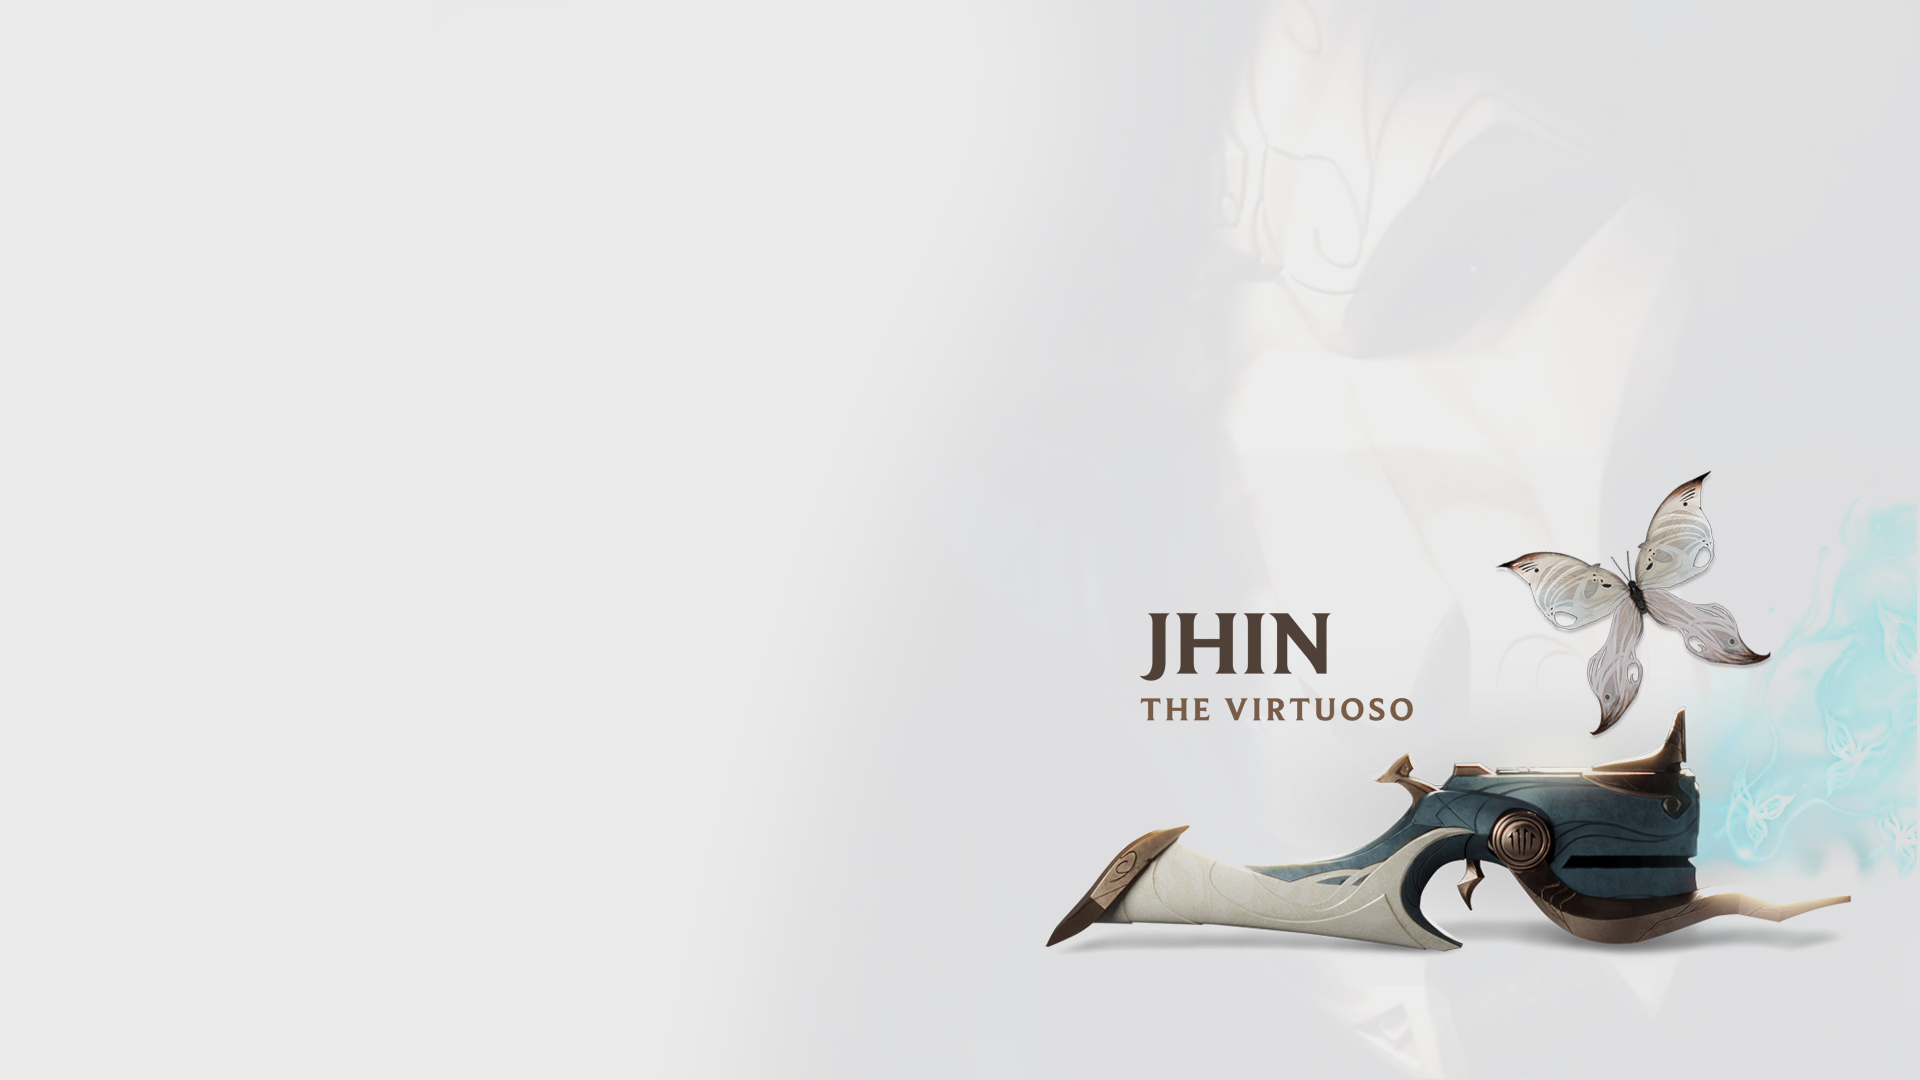 Jhin – The Virtuoso wallpaper